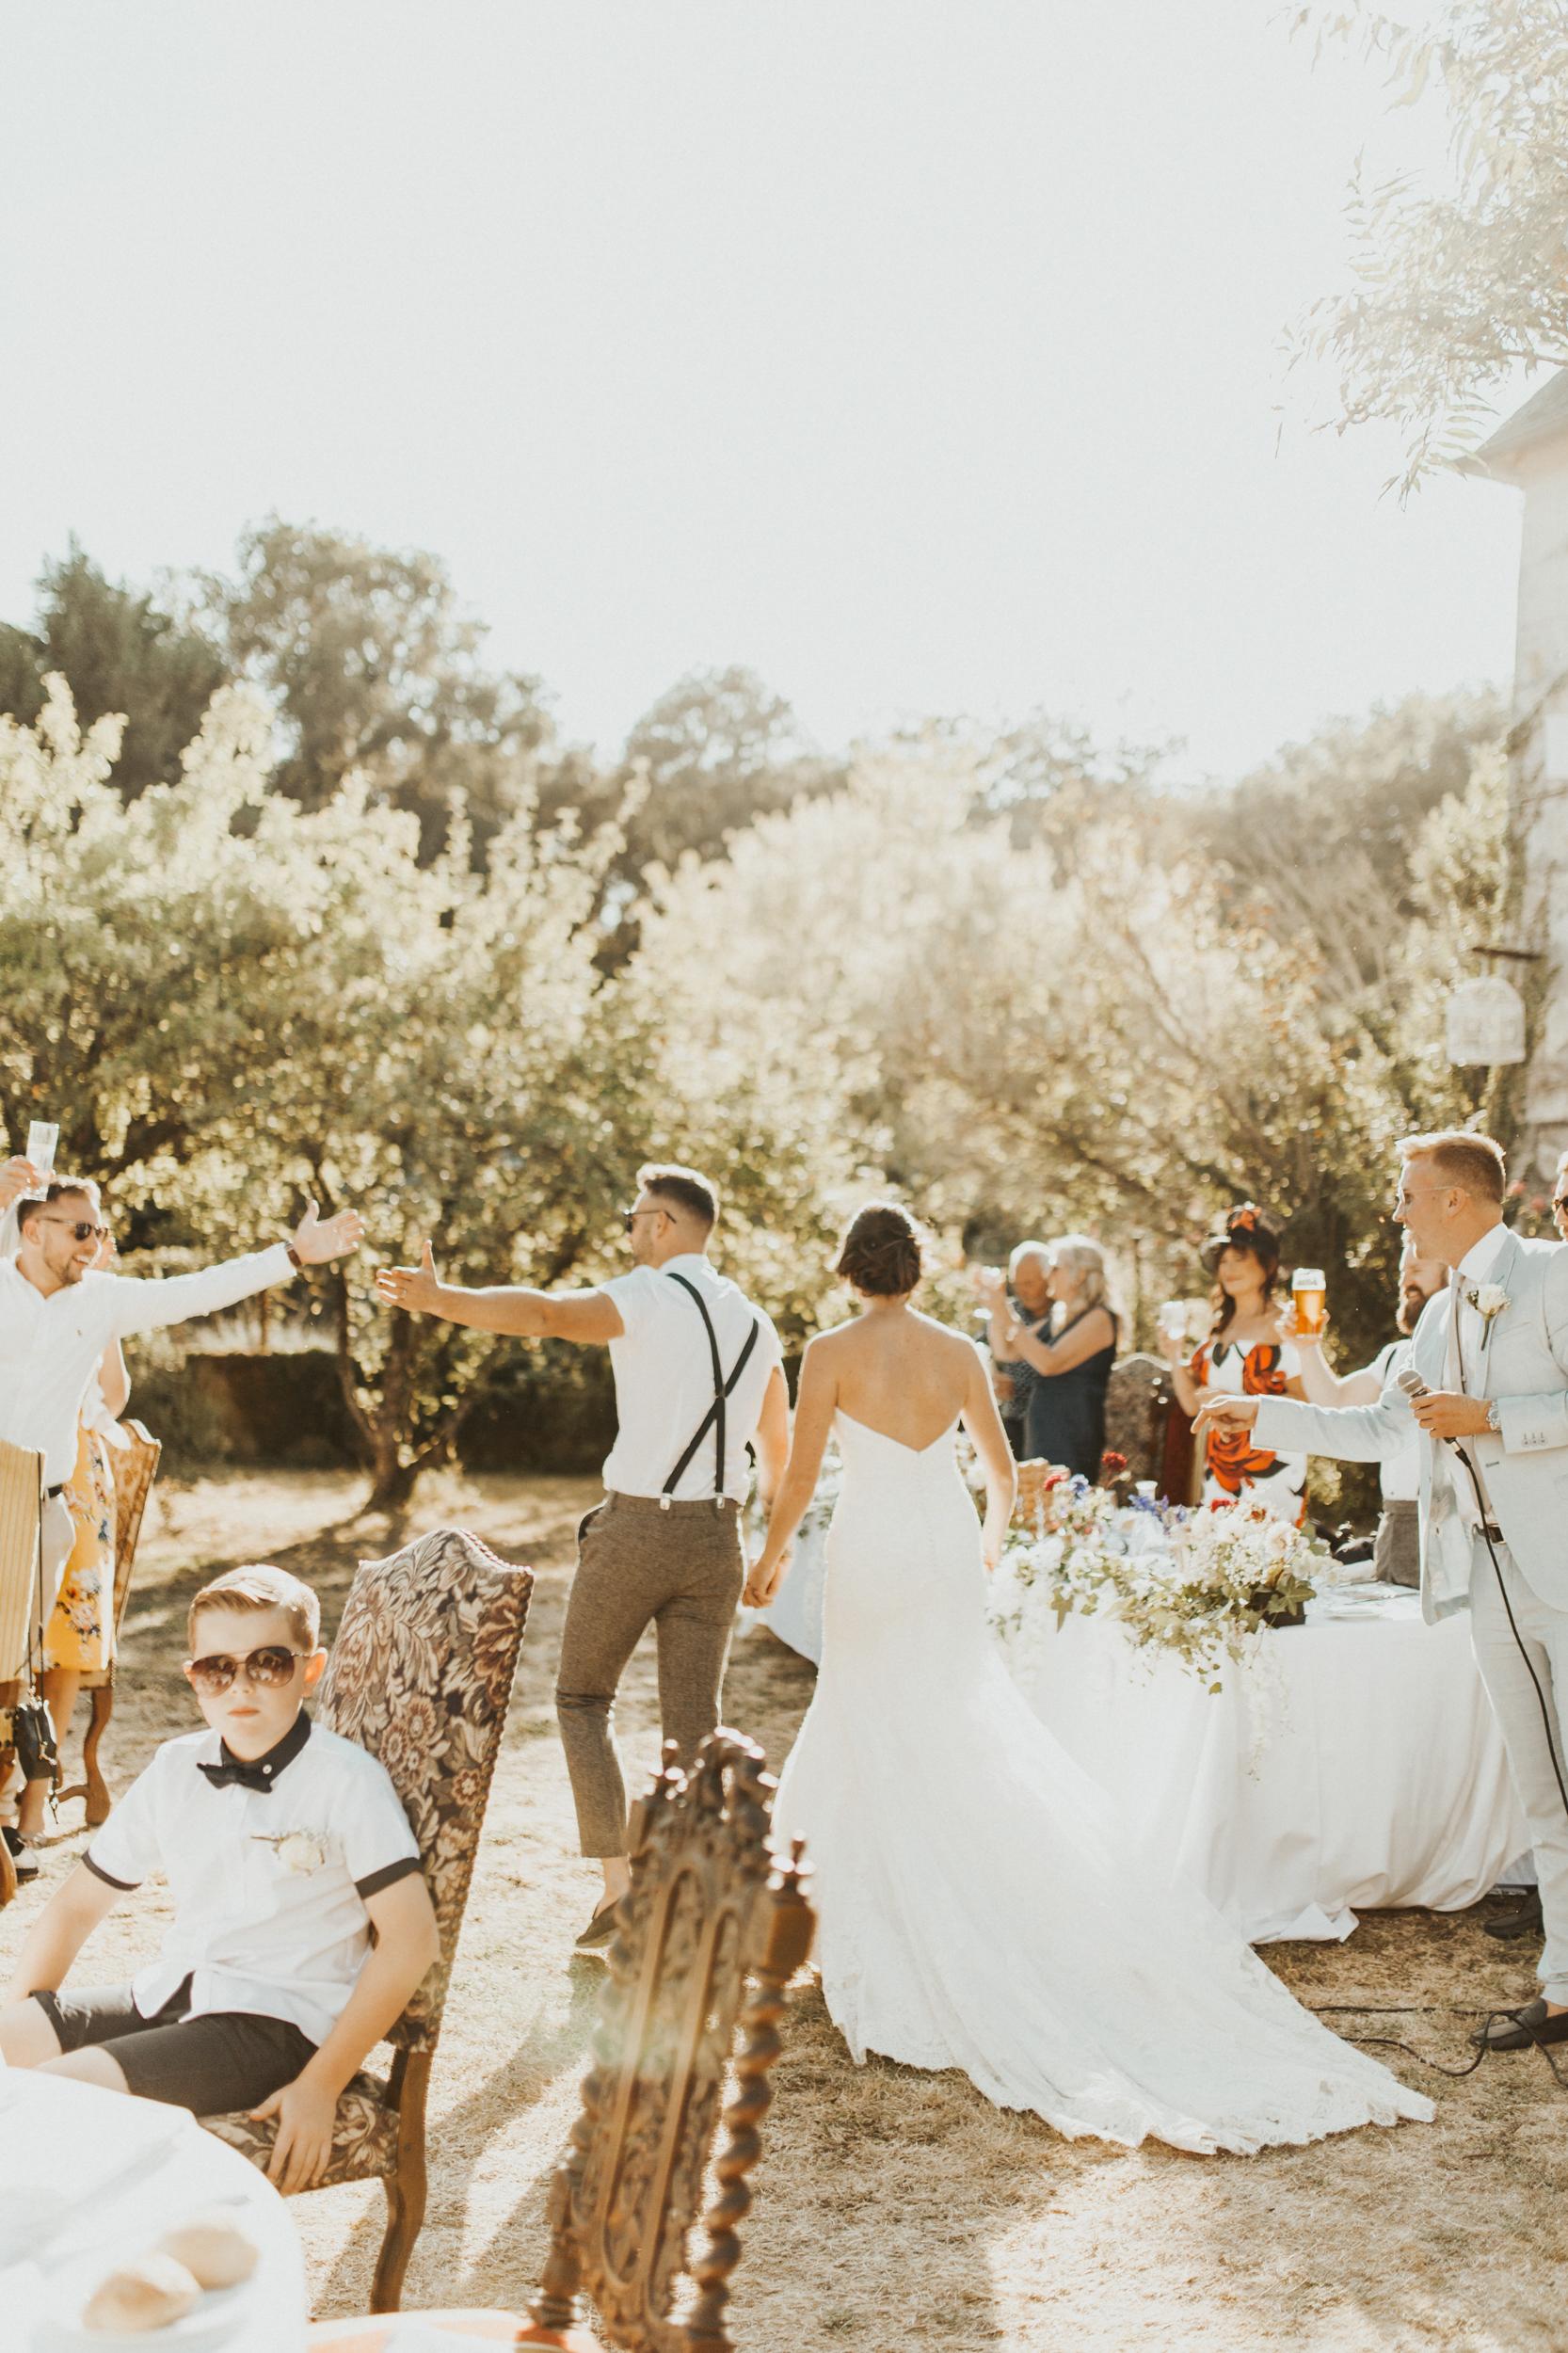 Amy-Zac-Destination-Wedding-France-Manoir-Foulquetiere-Darina-Stoda-Photography-77.jpg